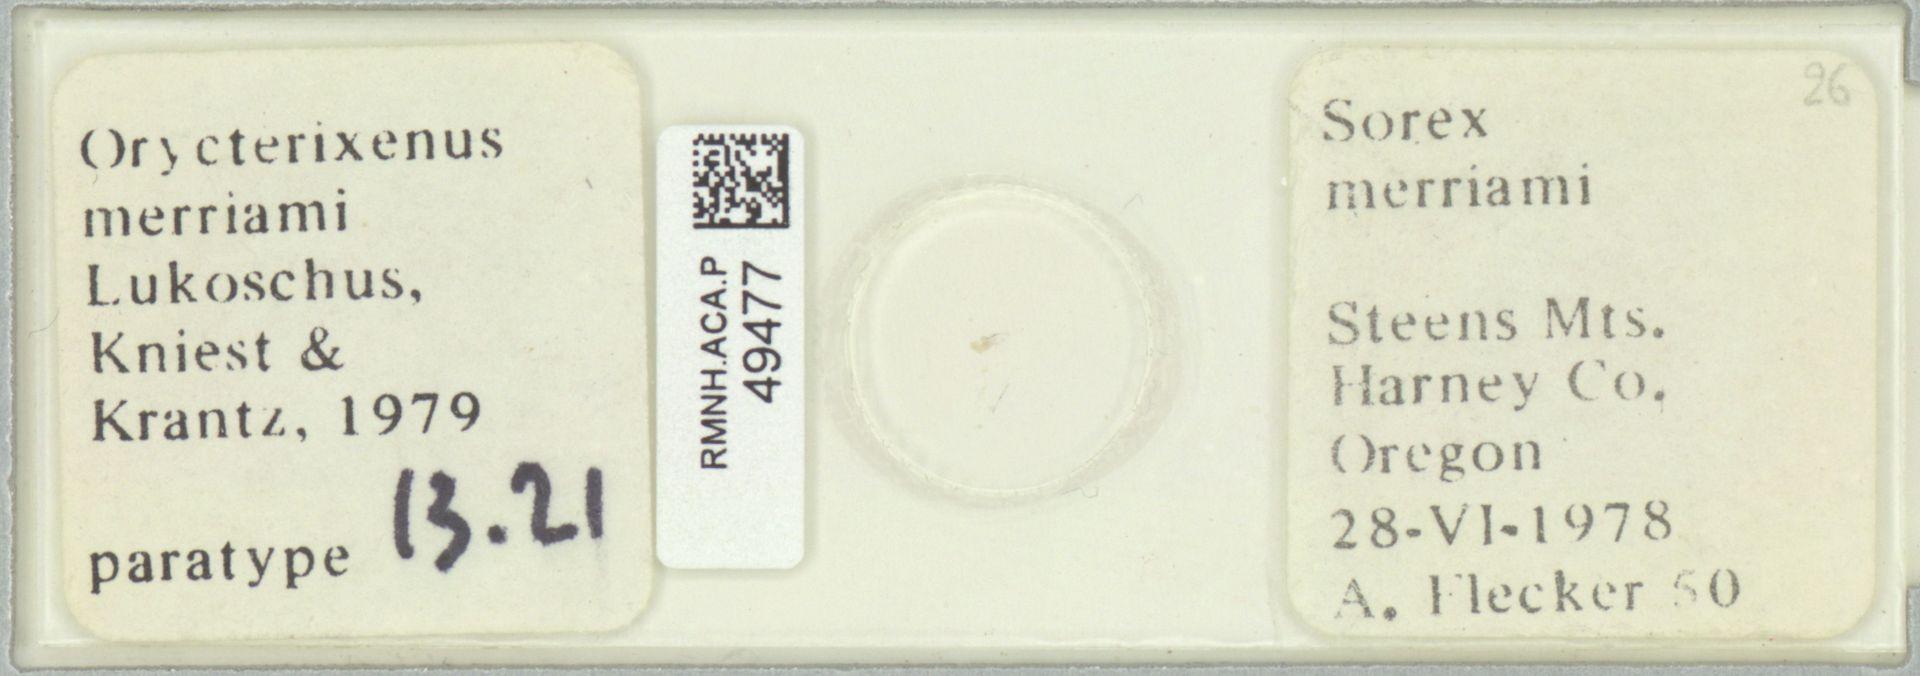 RMNH.ACA.P.49477 | Orycterixenus merriami Lukoschus, Kniest & Krantz, 1979